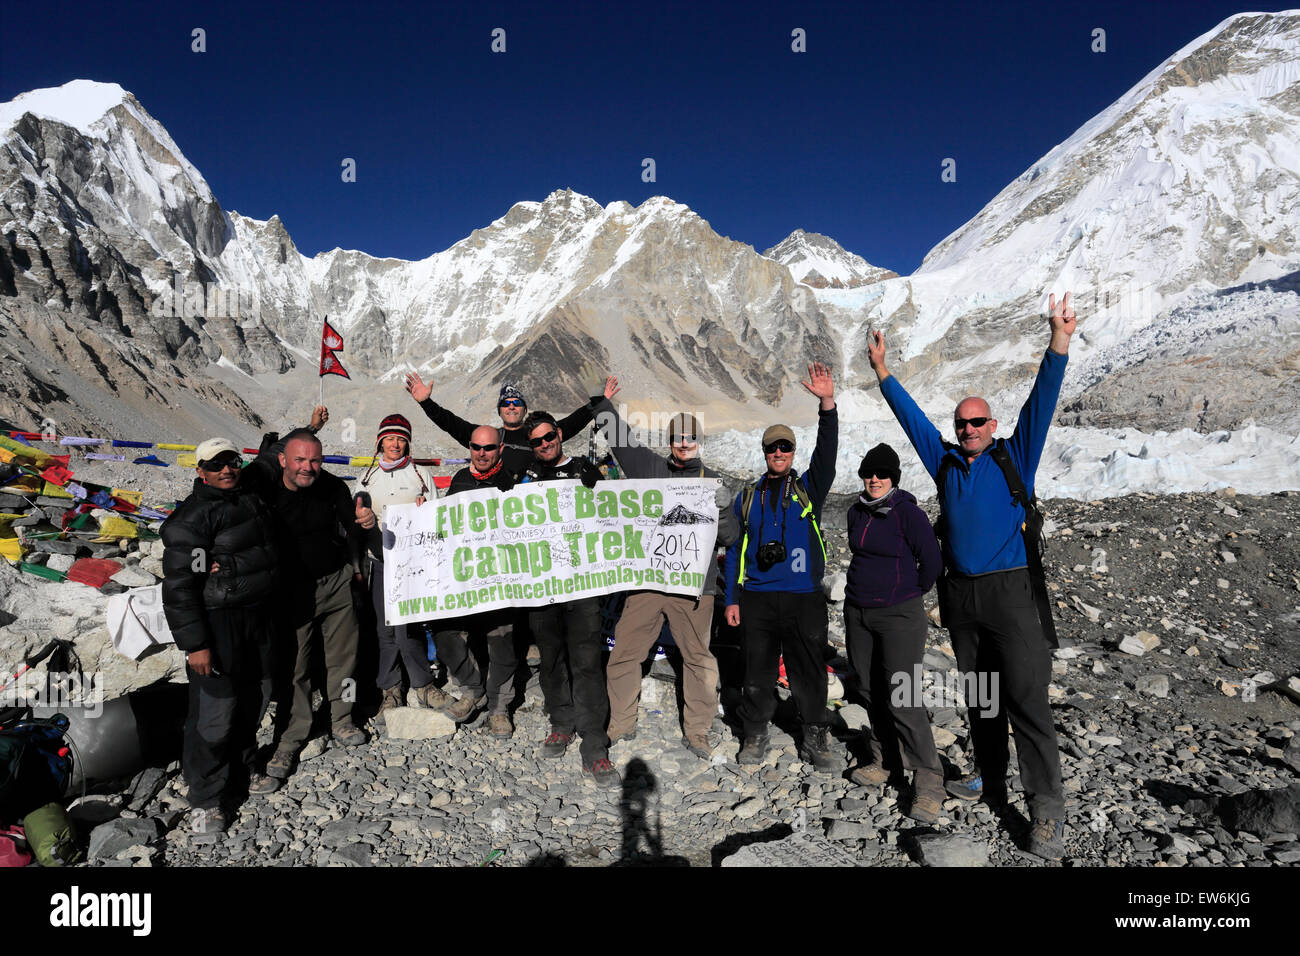 Trekkers at Everest base camp, UNESCO World Heritage Site, Sagarmatha National Park, Solu-Khumbu district, Khumbu - Stock Image